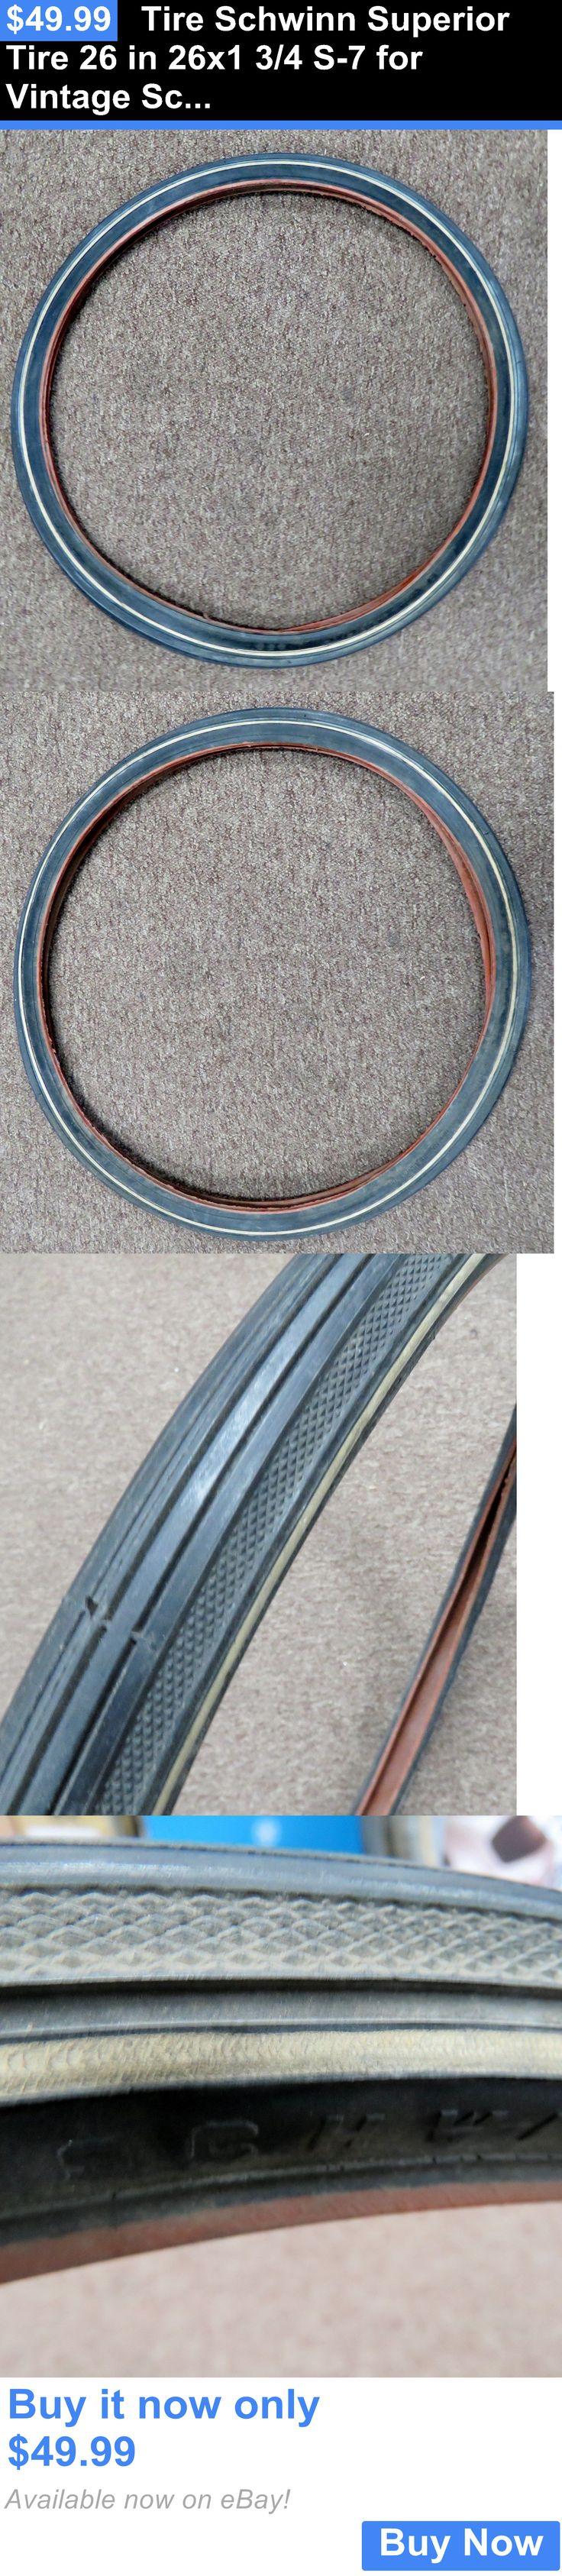 sporting goods: Tire Schwinn Superior Tire 26 In 26X1 3/4 S-7 For Vintage Schwinn Bike BUY IT NOW ONLY: $49.99